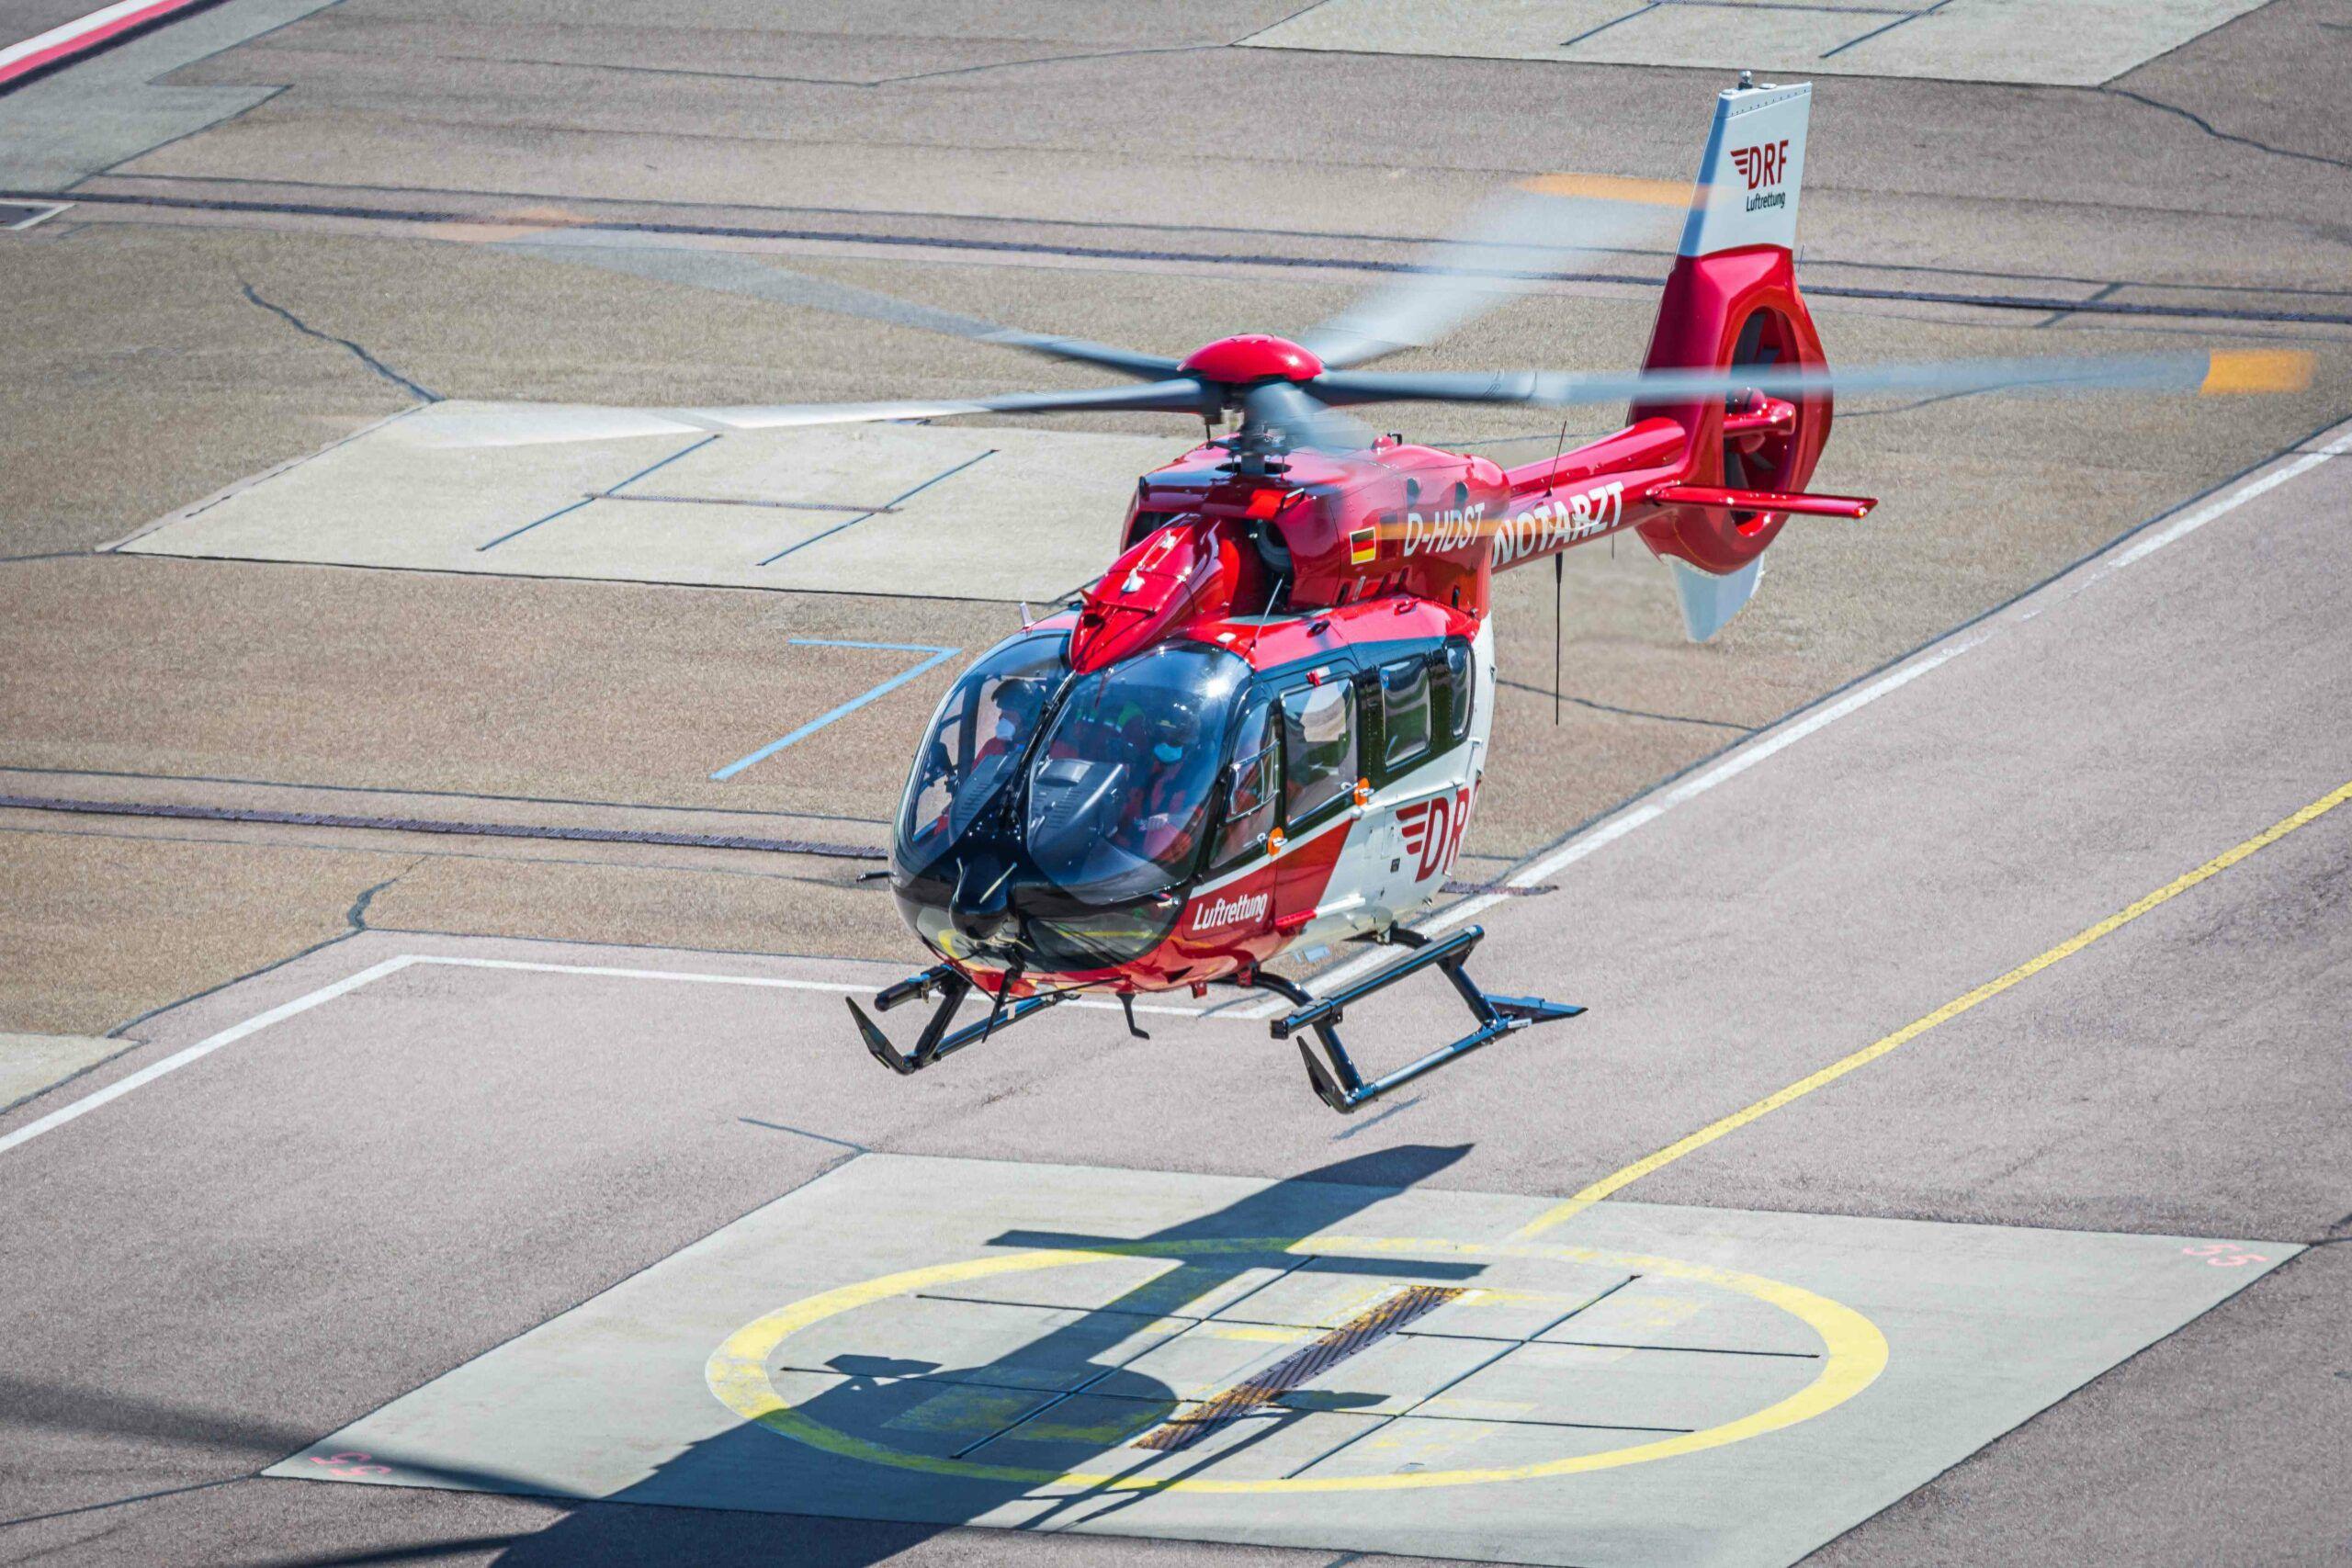 Erste Retrofit H145 Mit Fuenfblattrotor Retrofit Im Flug Quelle Airbus Helicopters Scaled